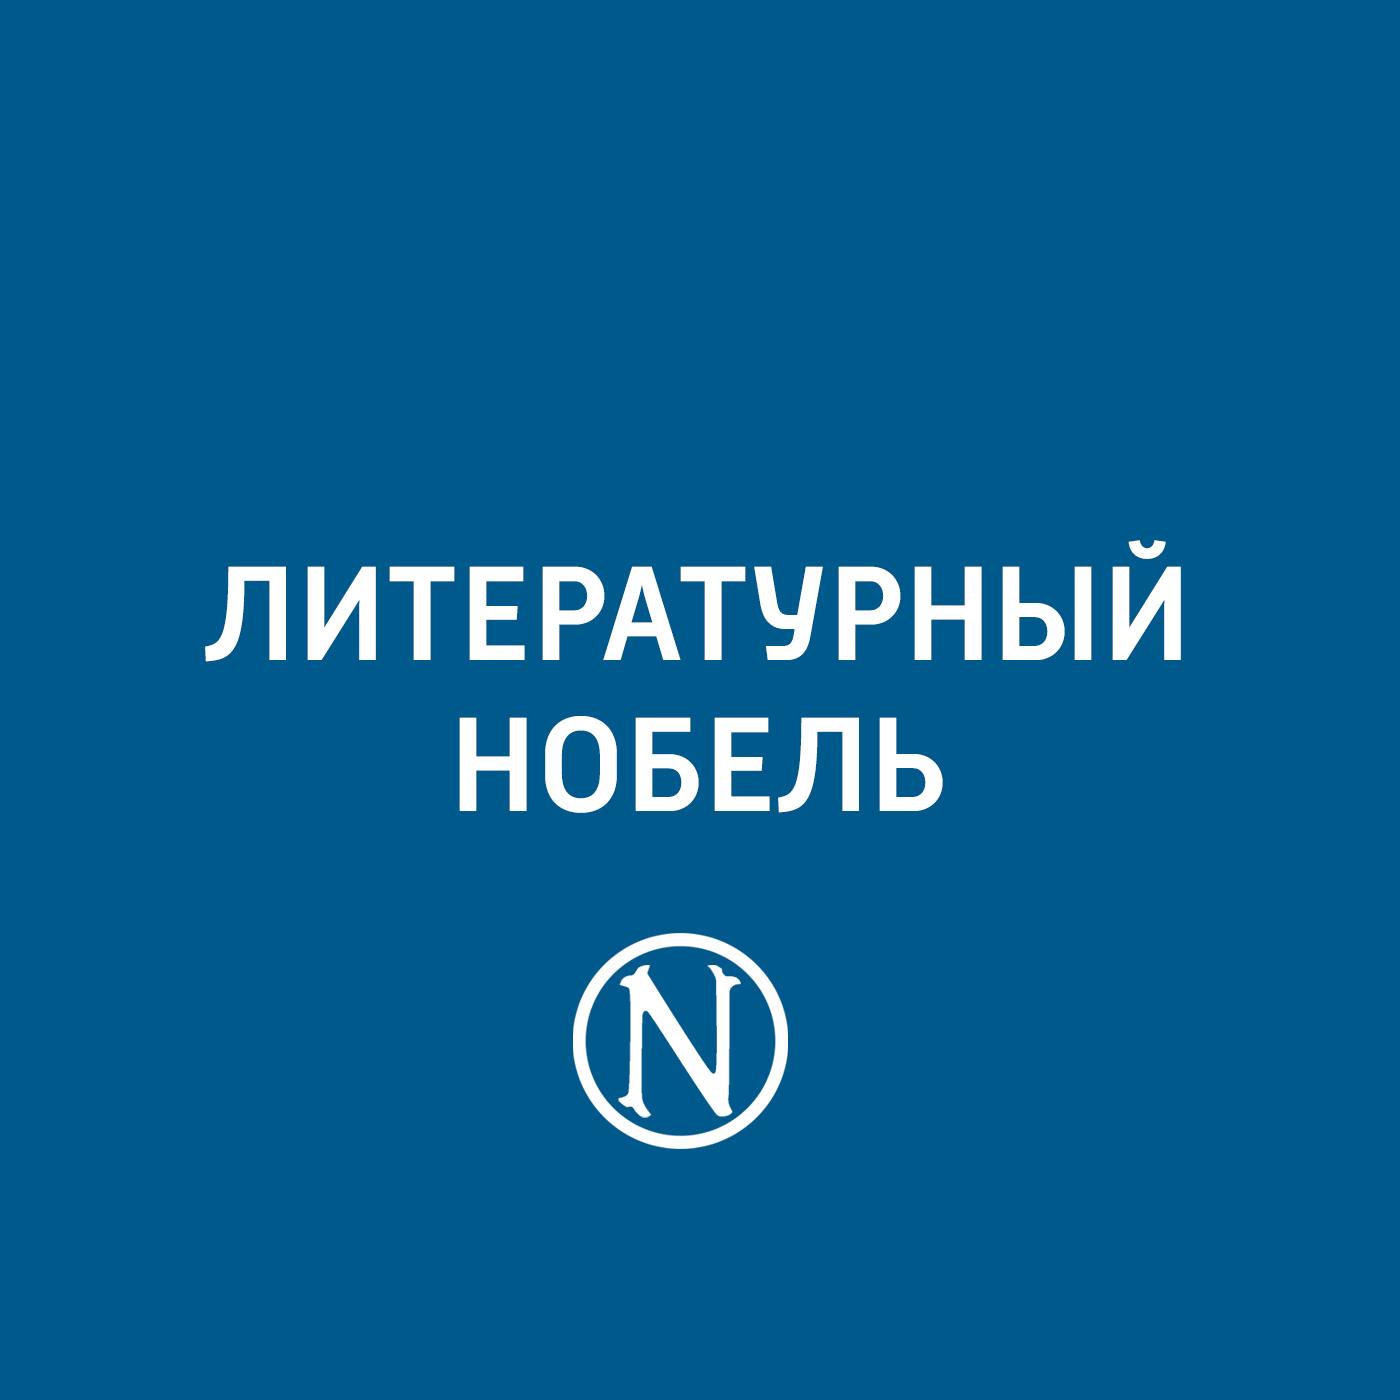 Евгений Стаховский Пабло Неруда replay replay ma964 953732 009